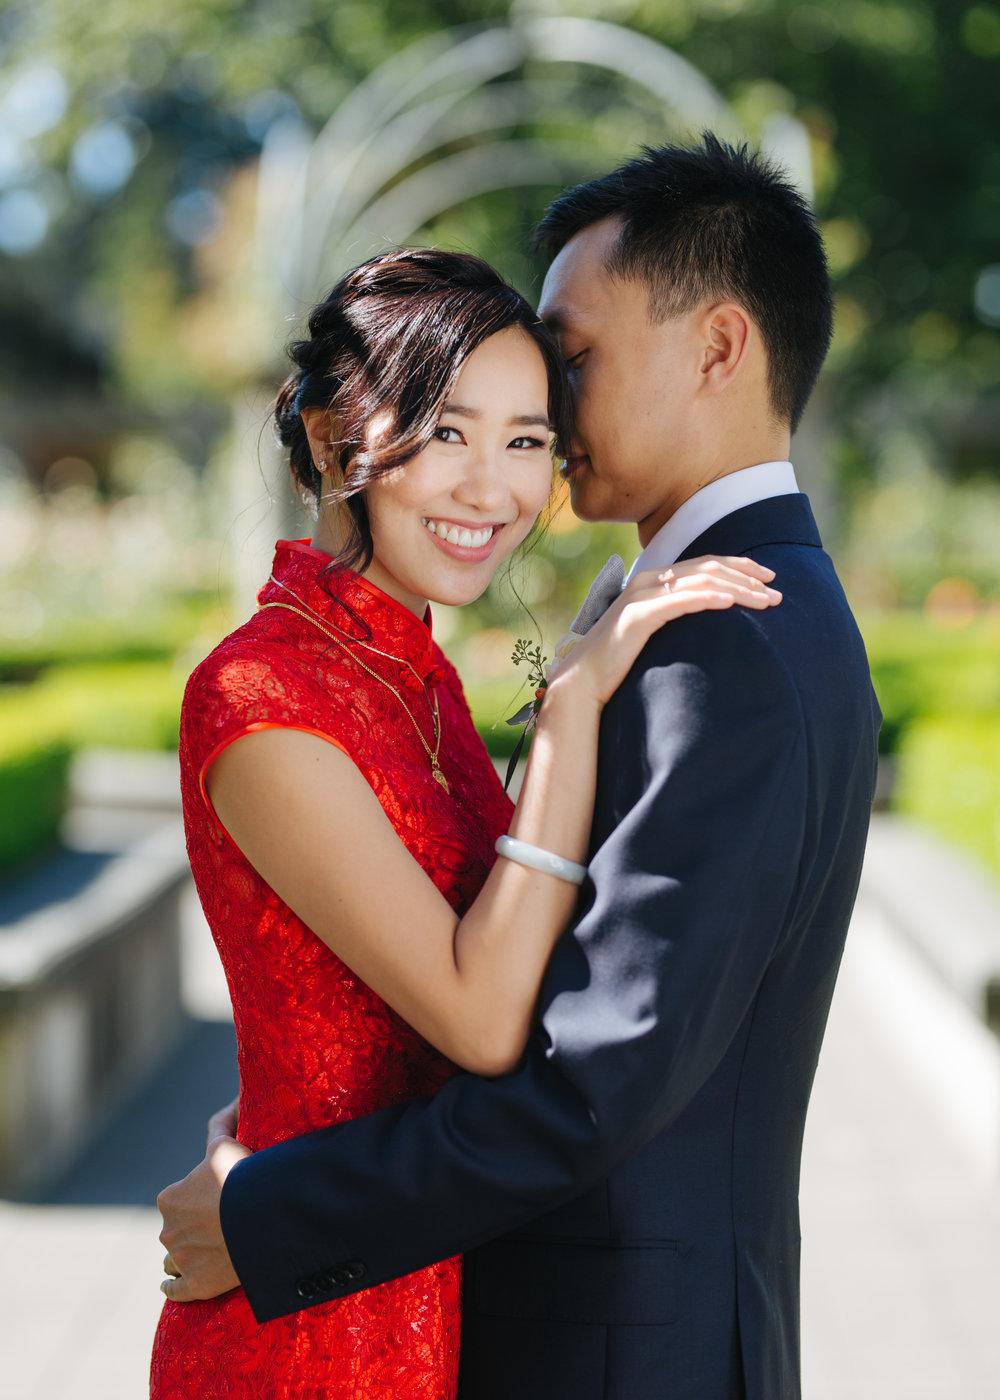 herastudios_wedding_julie_jason_hera_selects-21.jpg